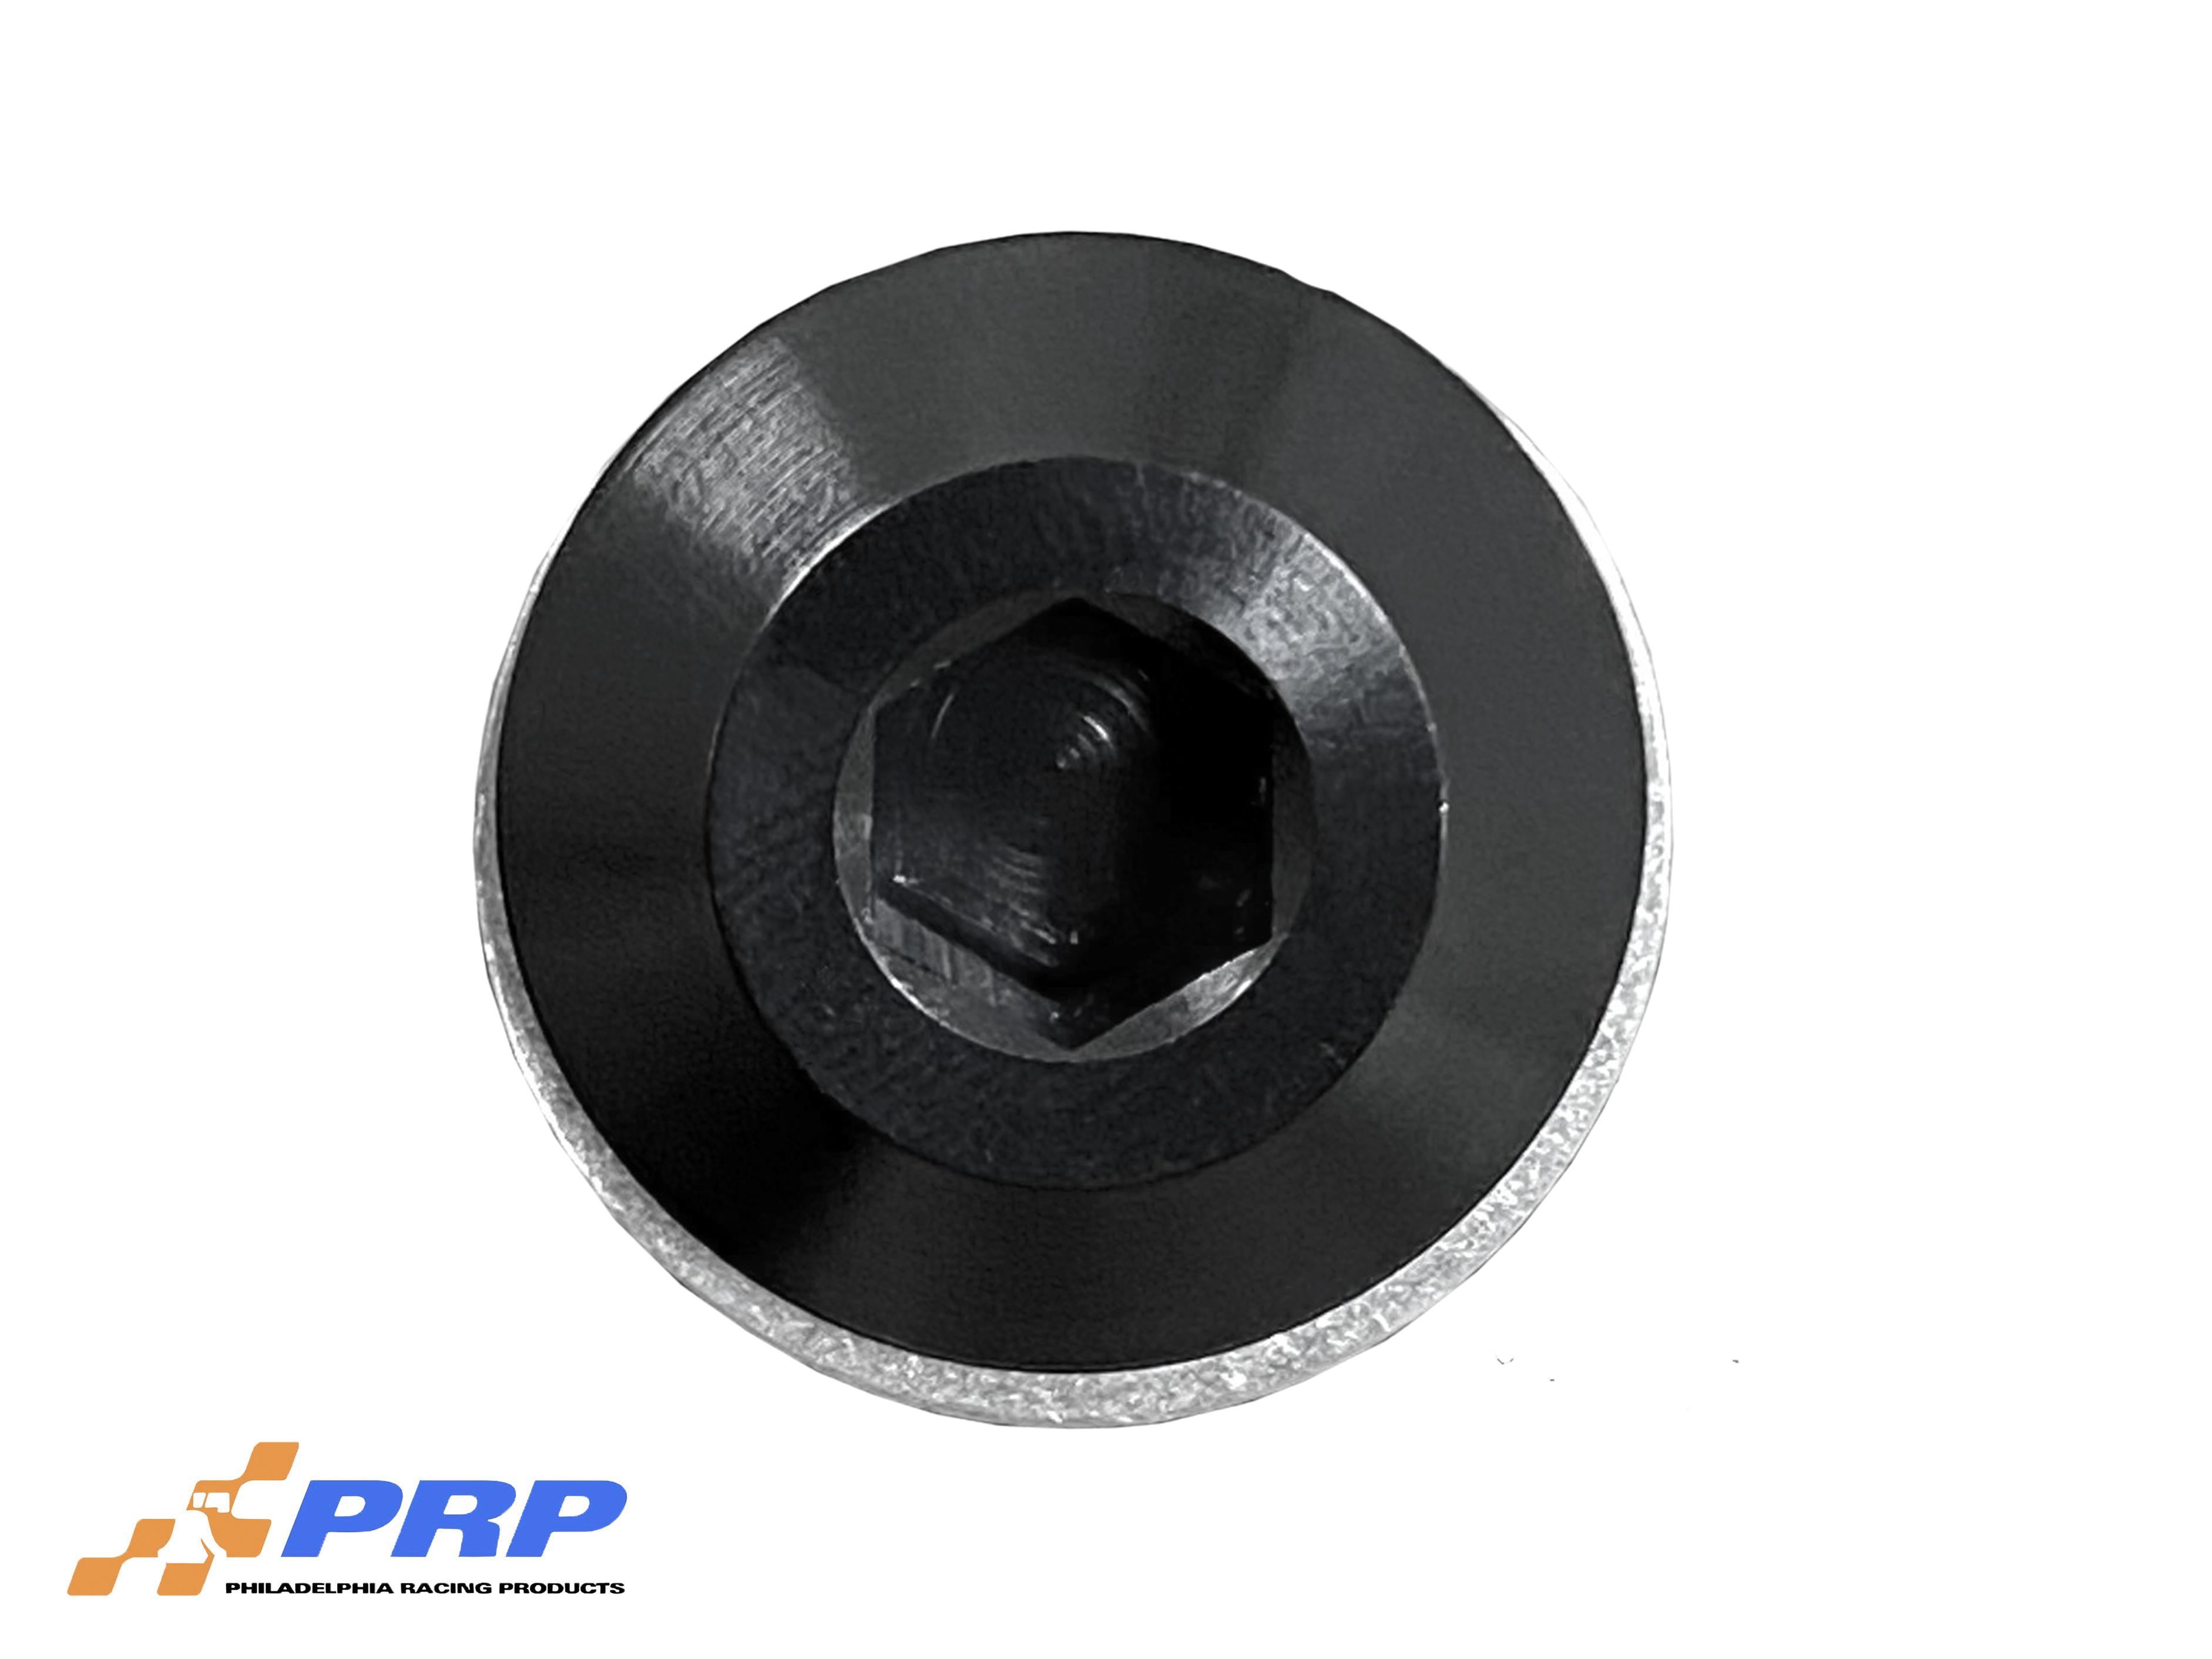 LS Oil Pan Pressure Relief Valve Plug Kit